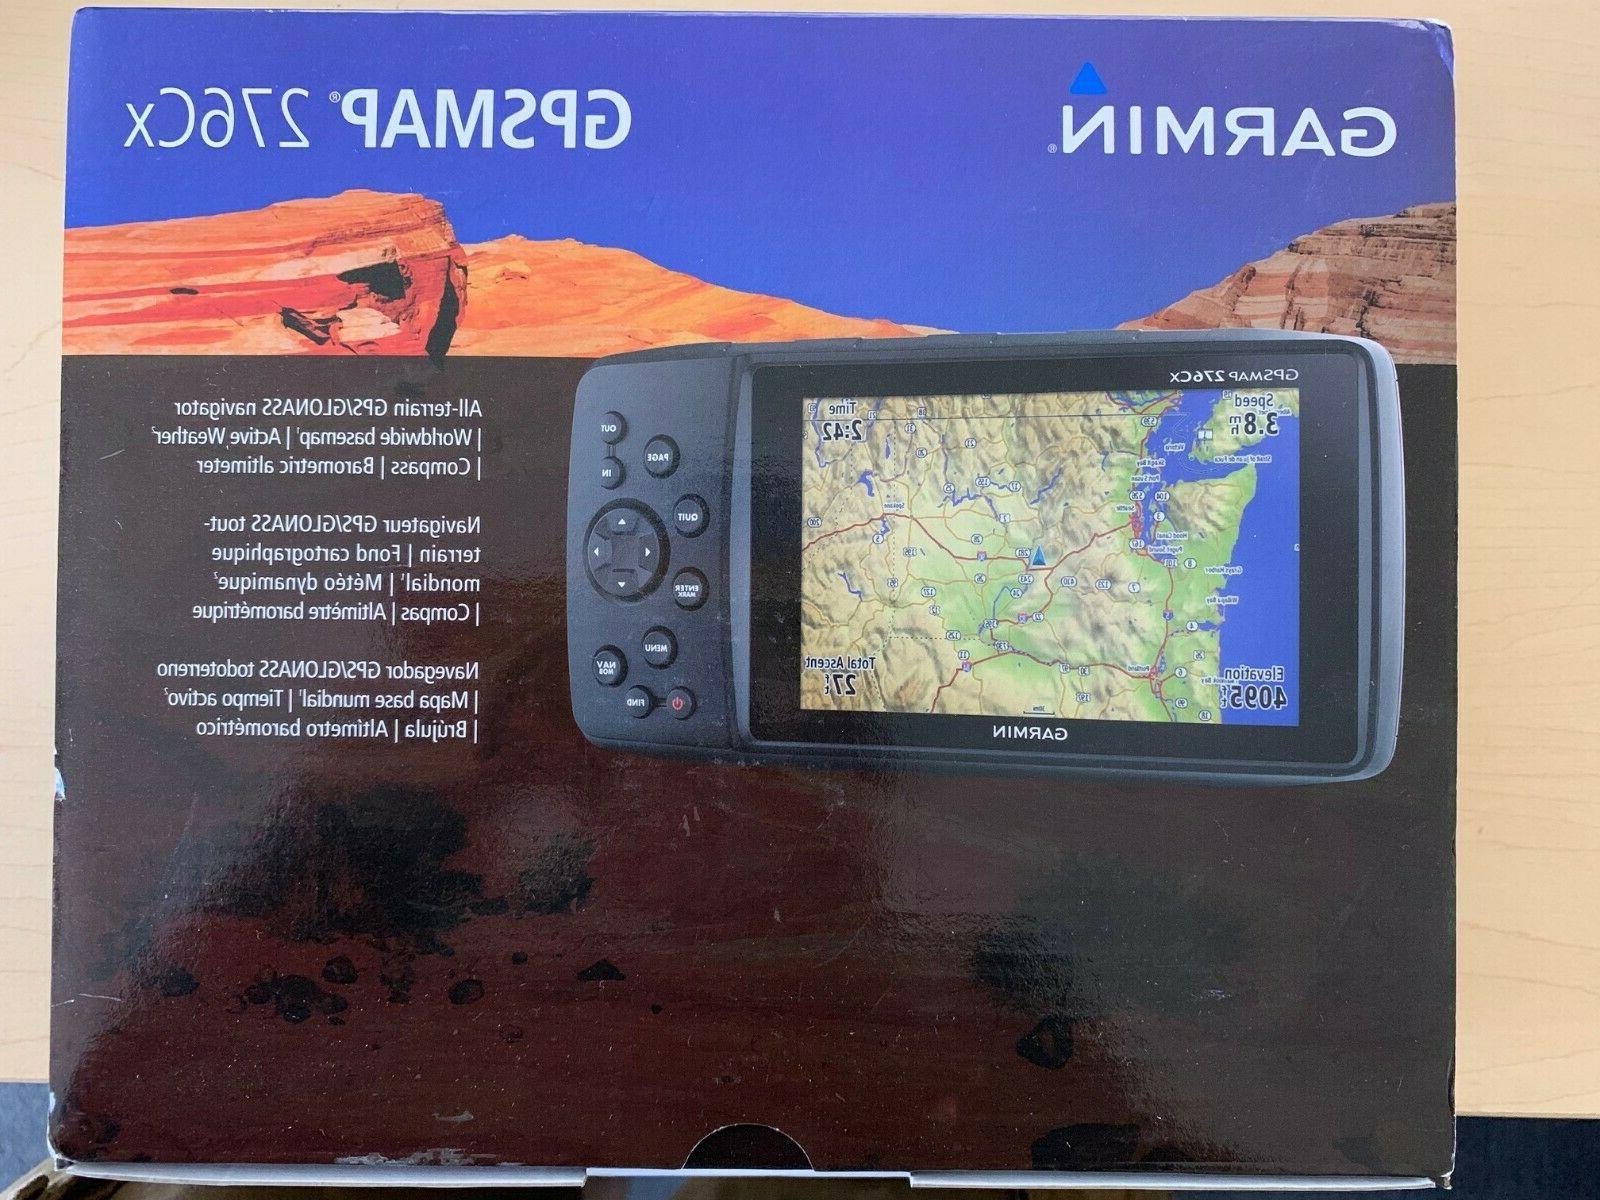 Garmin All-terrain GPS 010-01607-00